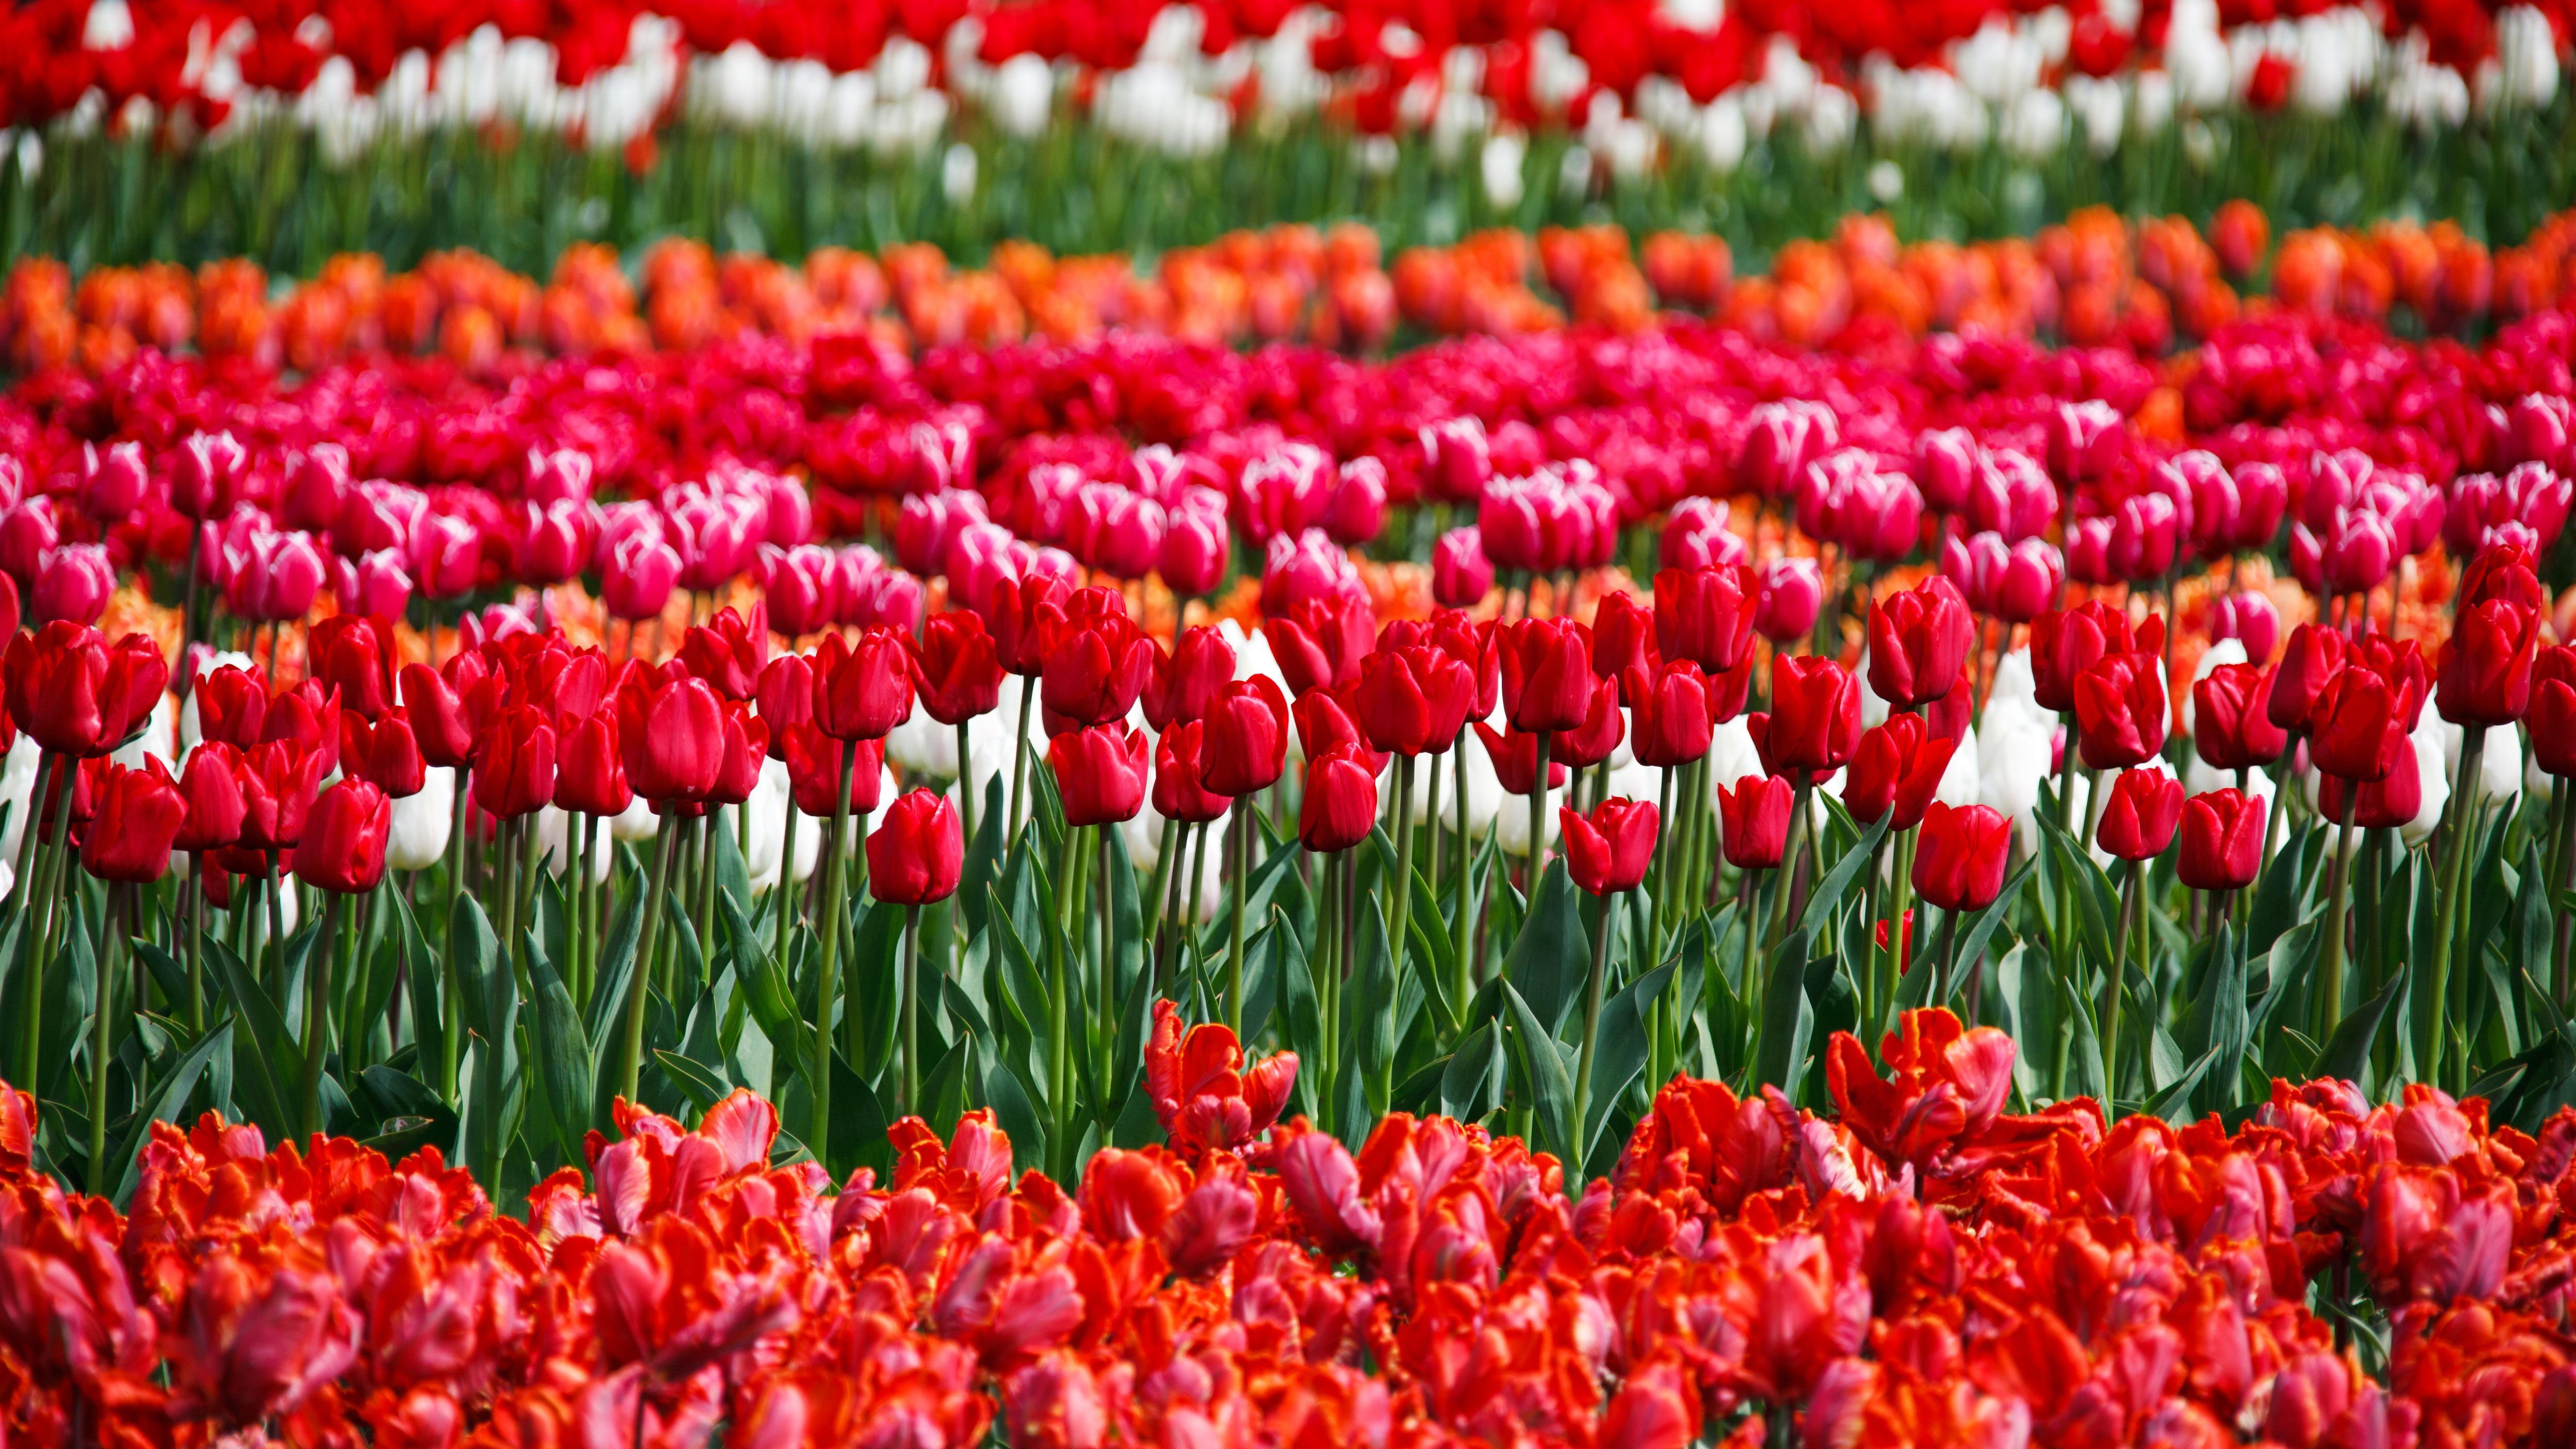 Free Images : flower, petal, bloom, tulip, spring, green, red, color ...